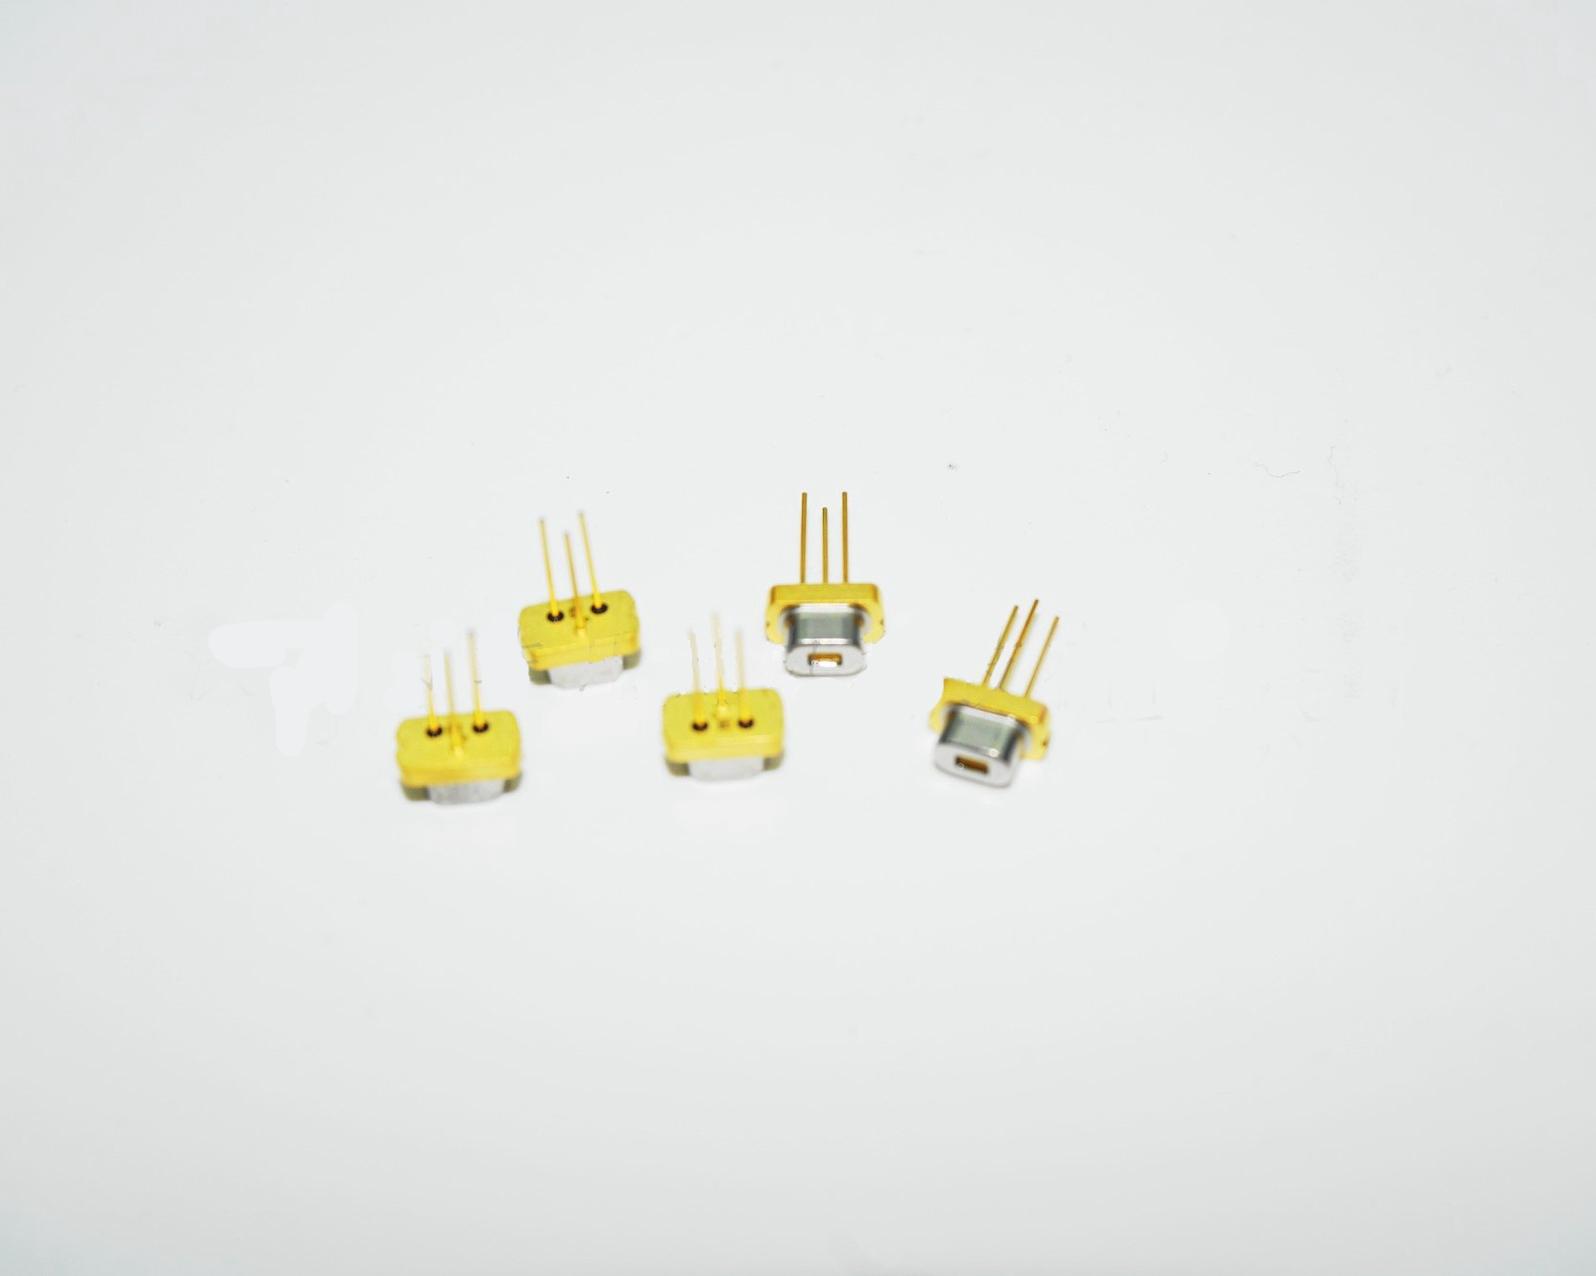 Nichia Violet 405nm-450nm Laser Diode NDV4632